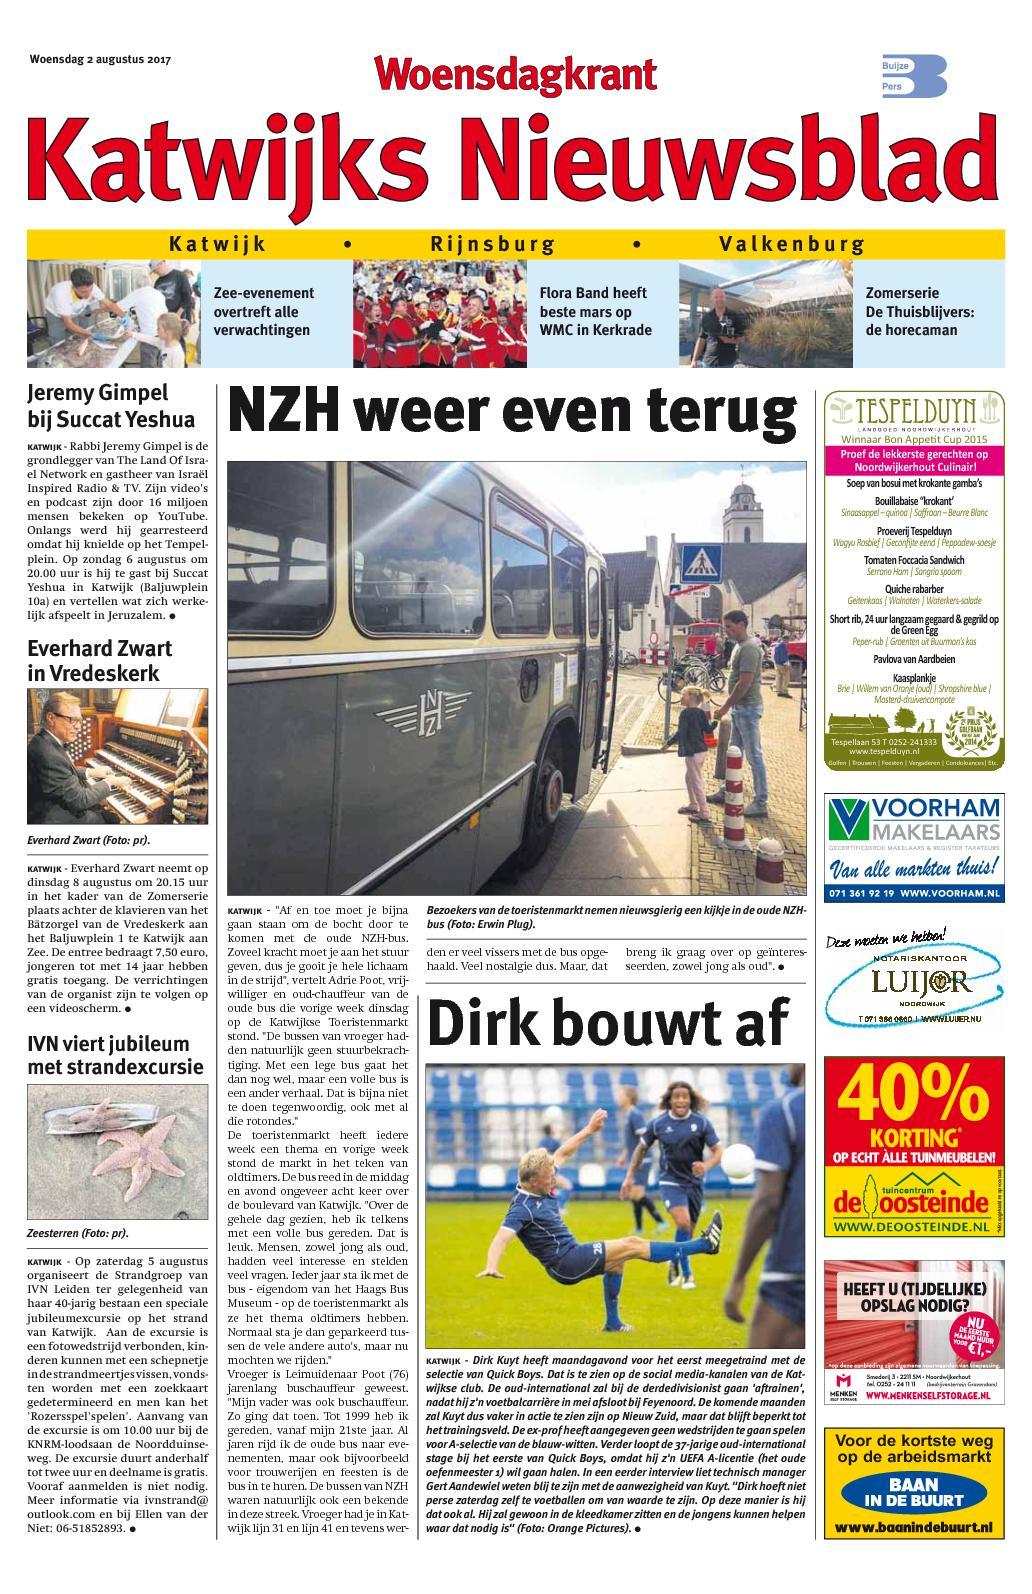 calamà o katwijks nieuwsblad 02 08 2017